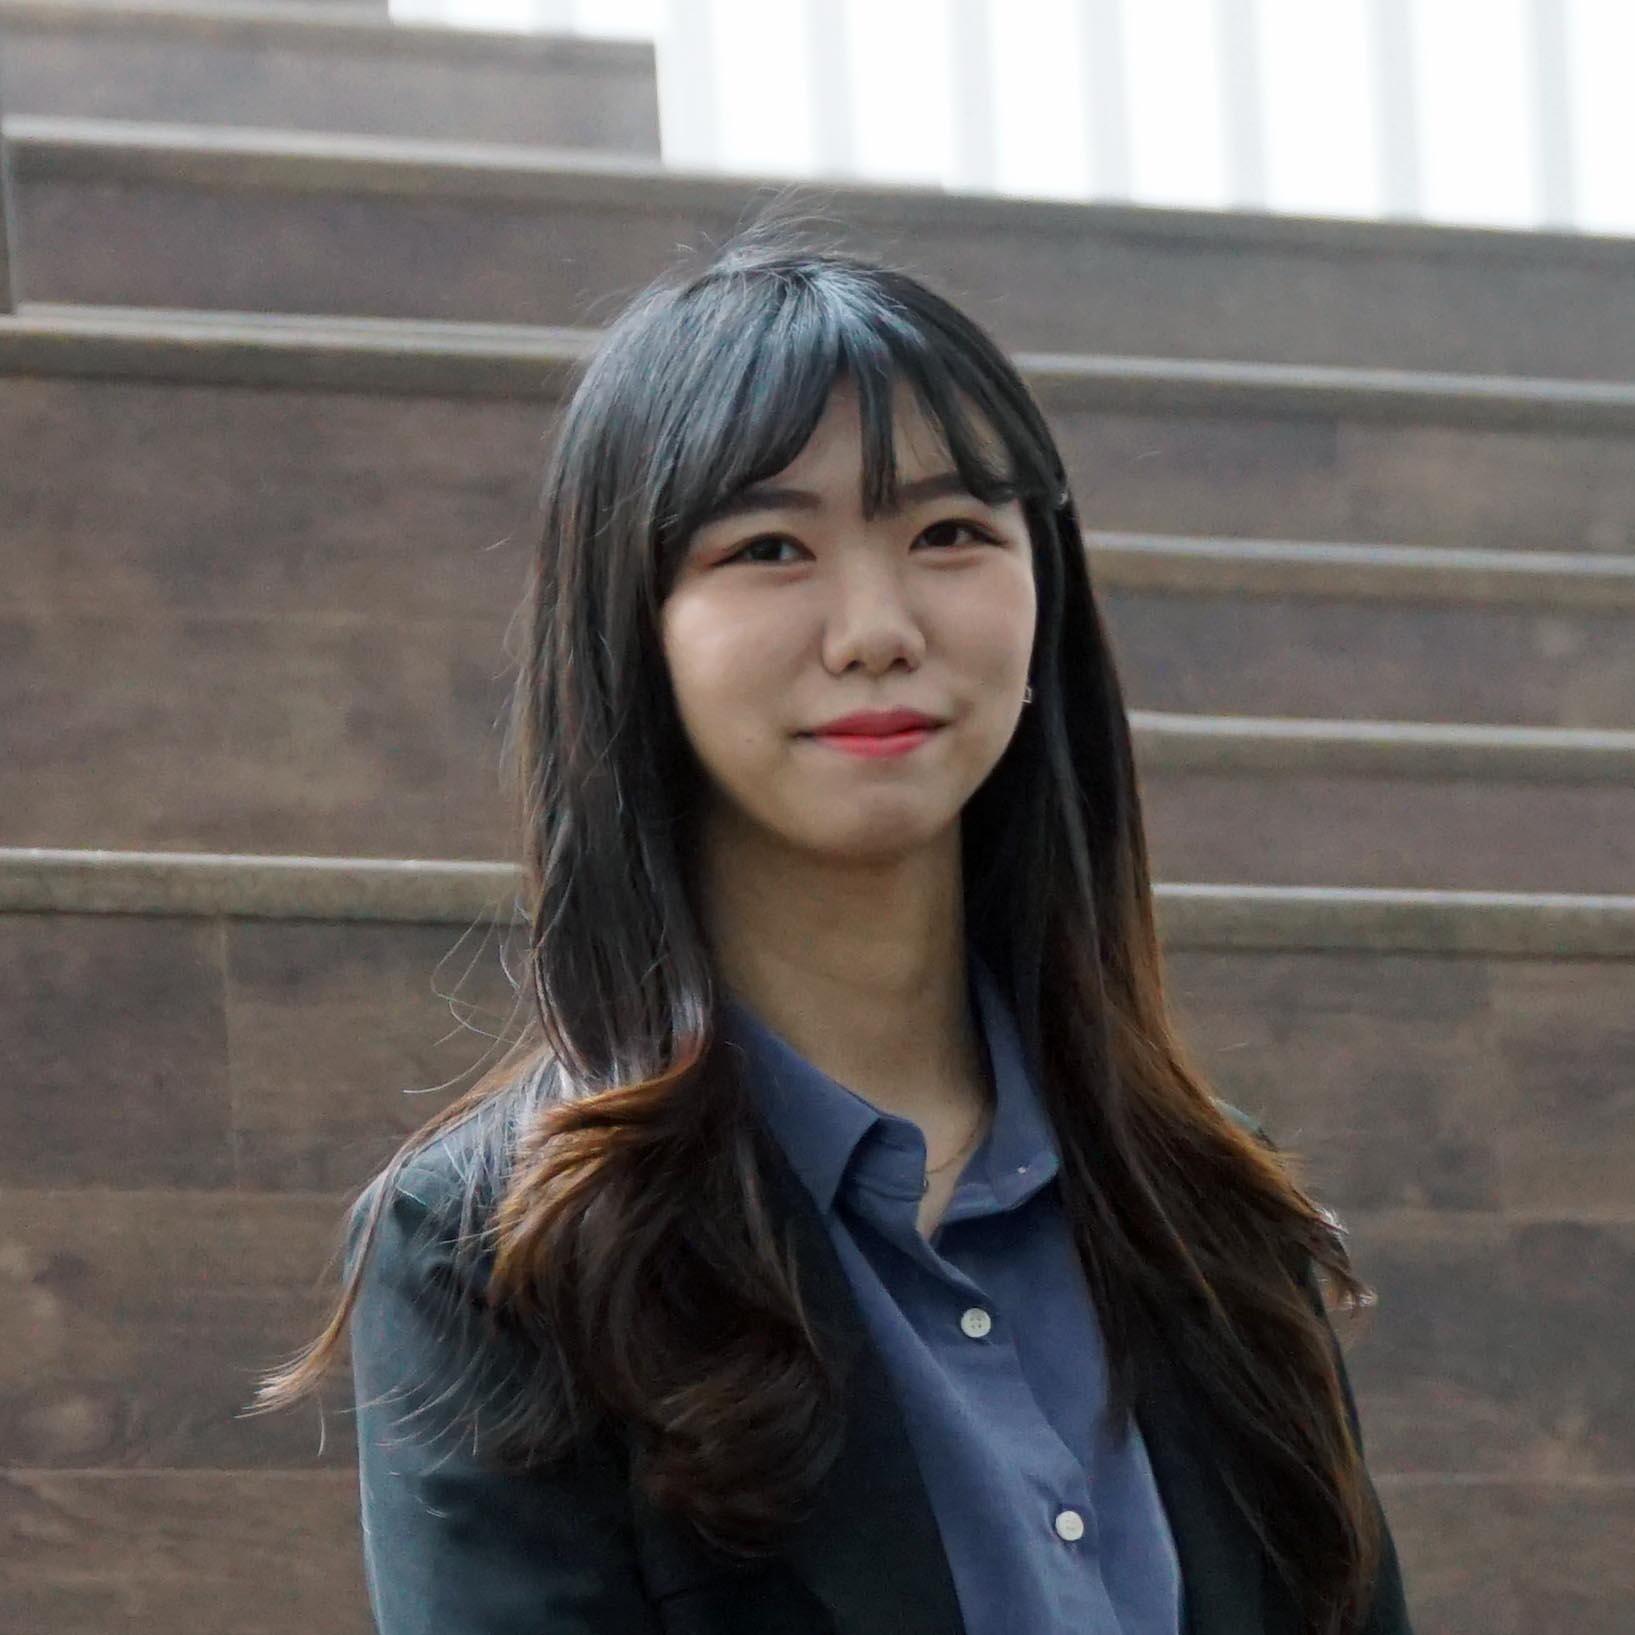 Yoonji Lee